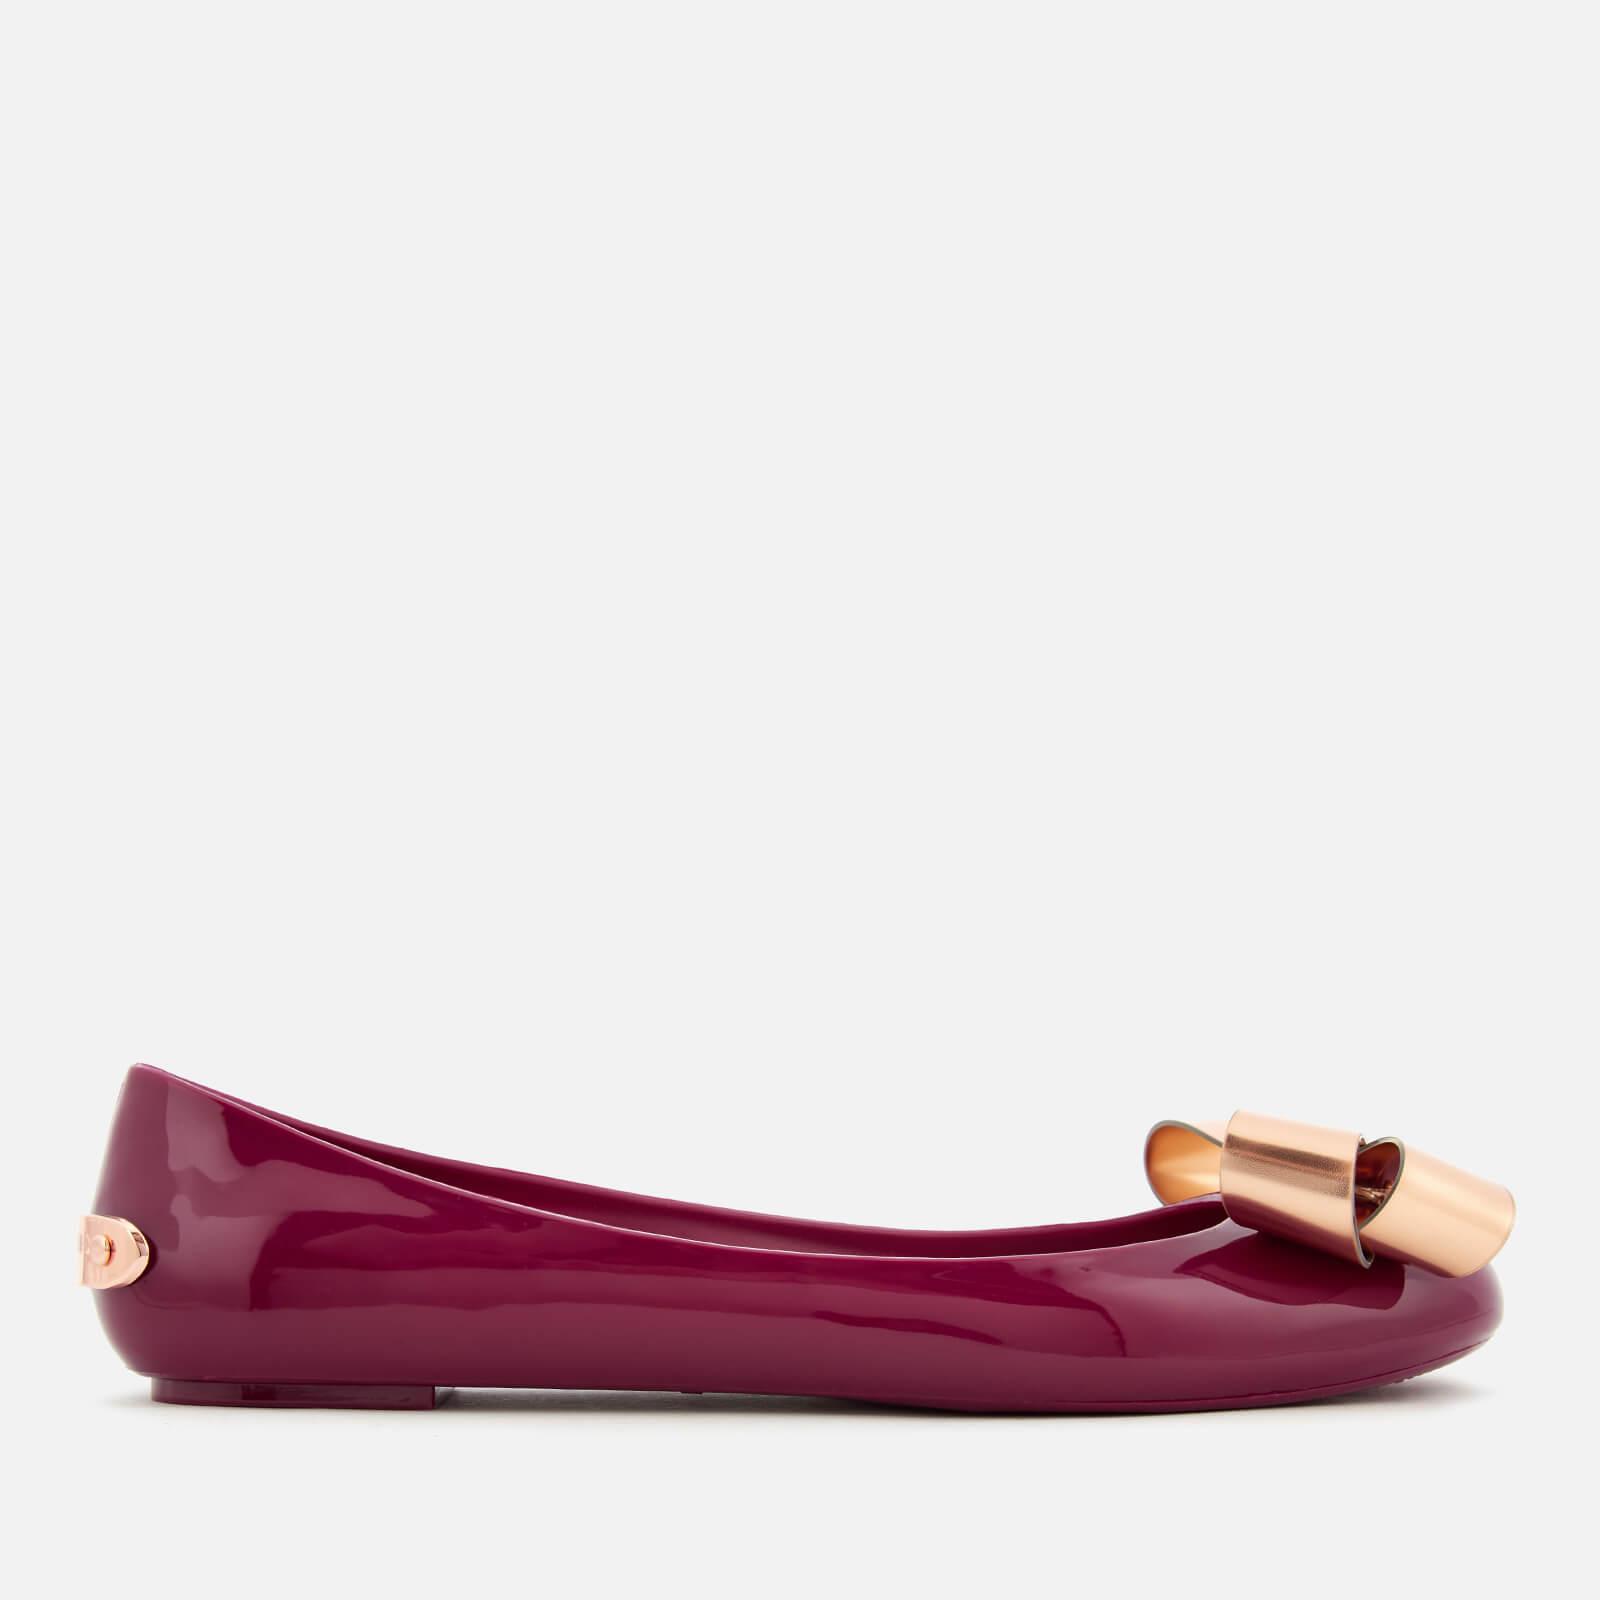 efa773cc1 Ted Baker Women s Larmiap Bow Ballet Flats - Maroon Serenity Womens  Footwear